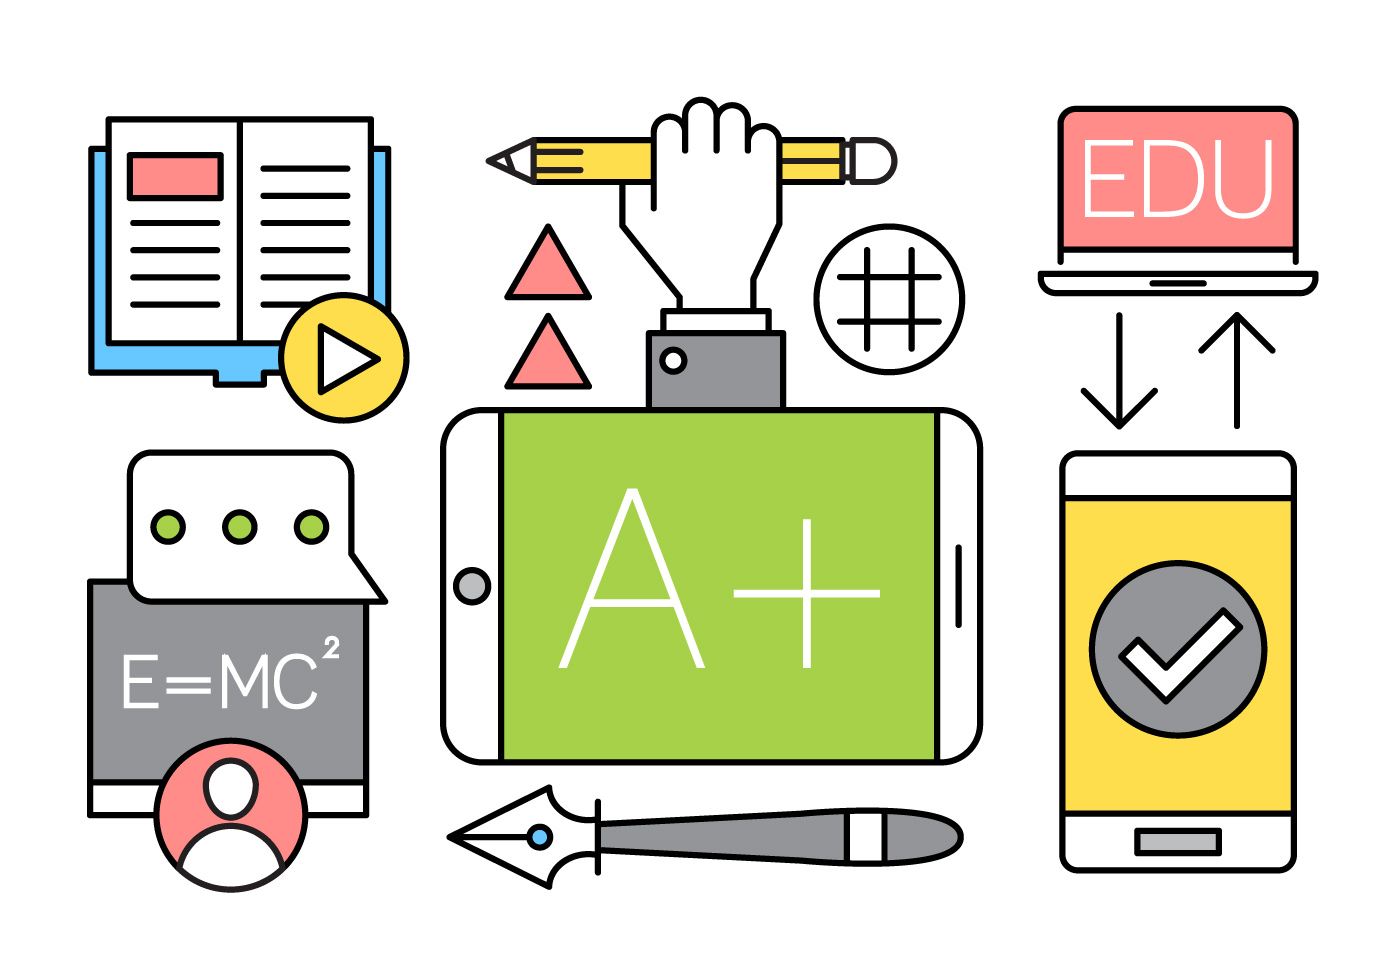 linear-education-vector-elements.jpg